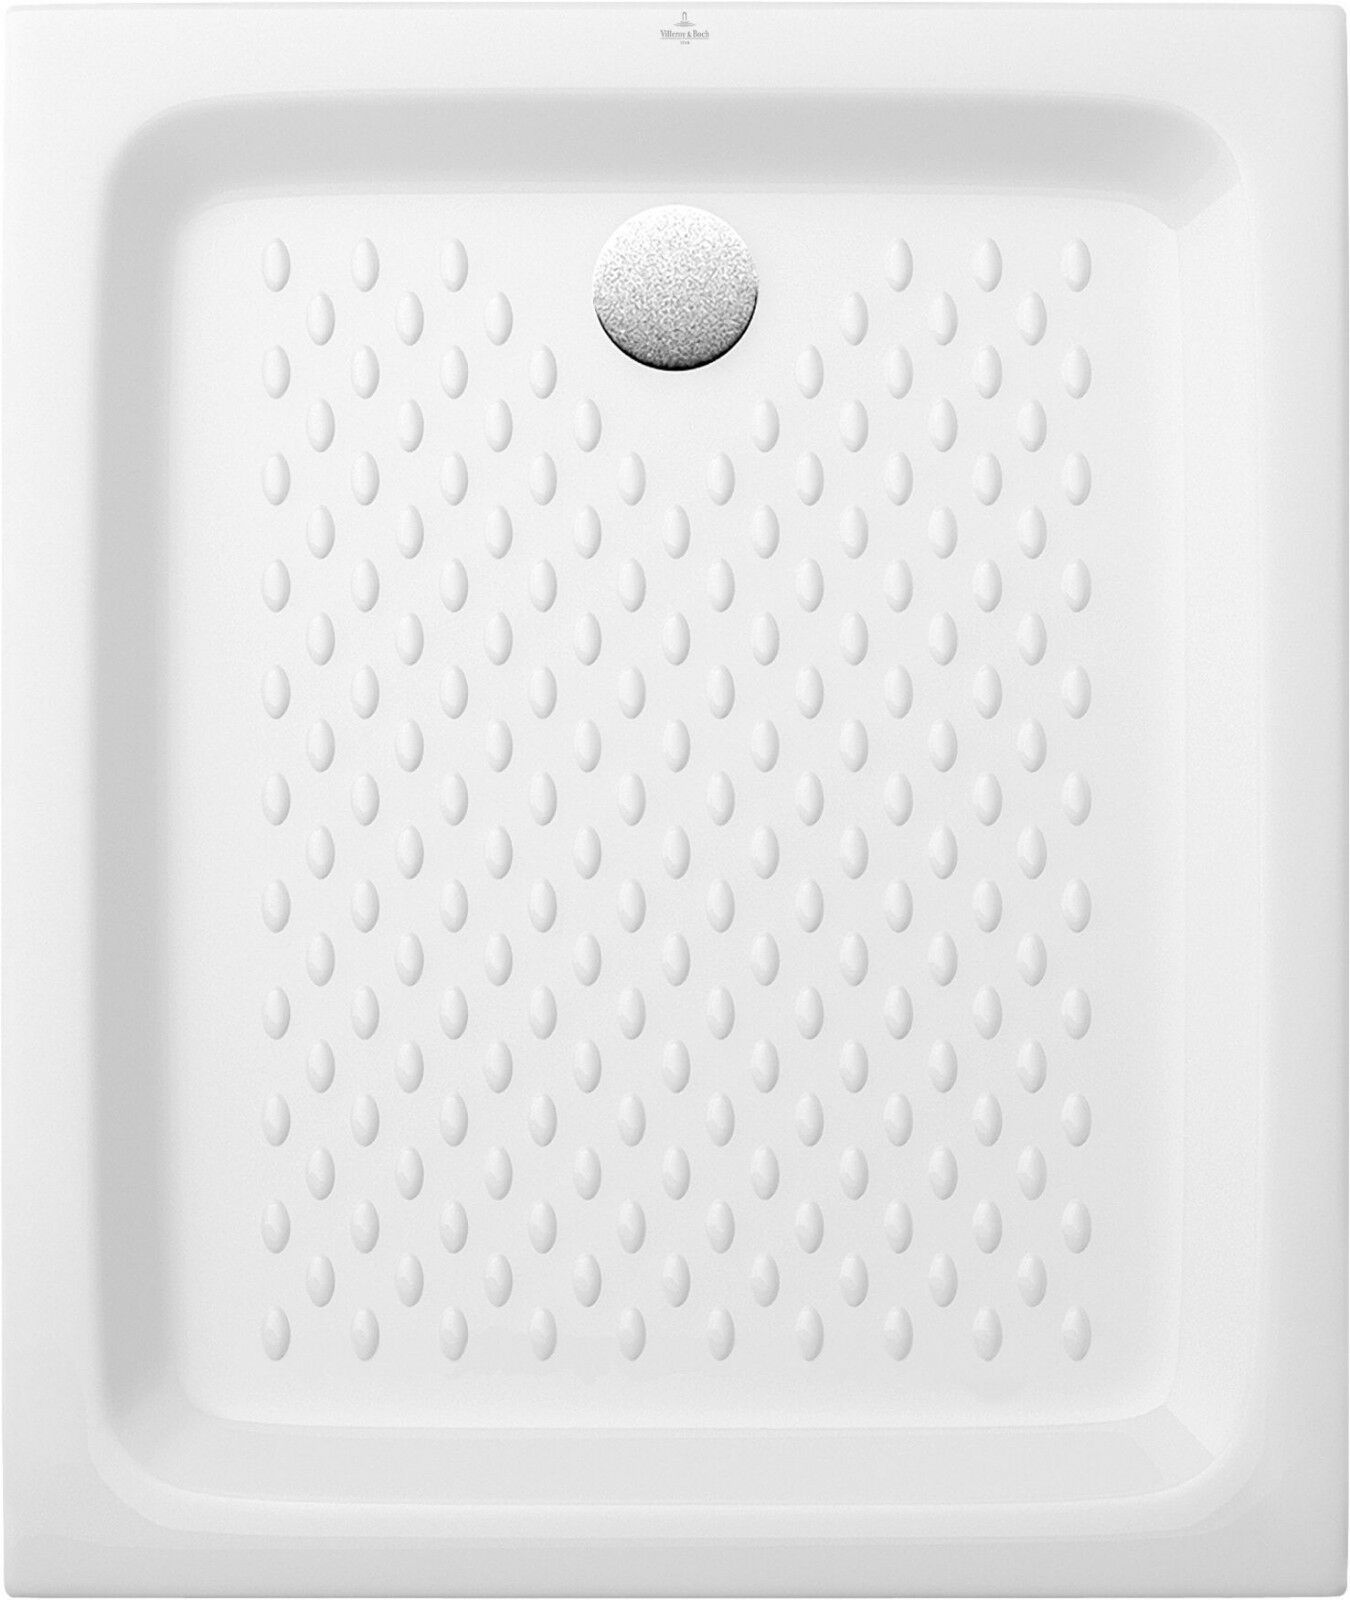 Piatto doccia cm 120x80 h 10 Villeroy & Boch mod. O.NOVO 6029A201 Bianco